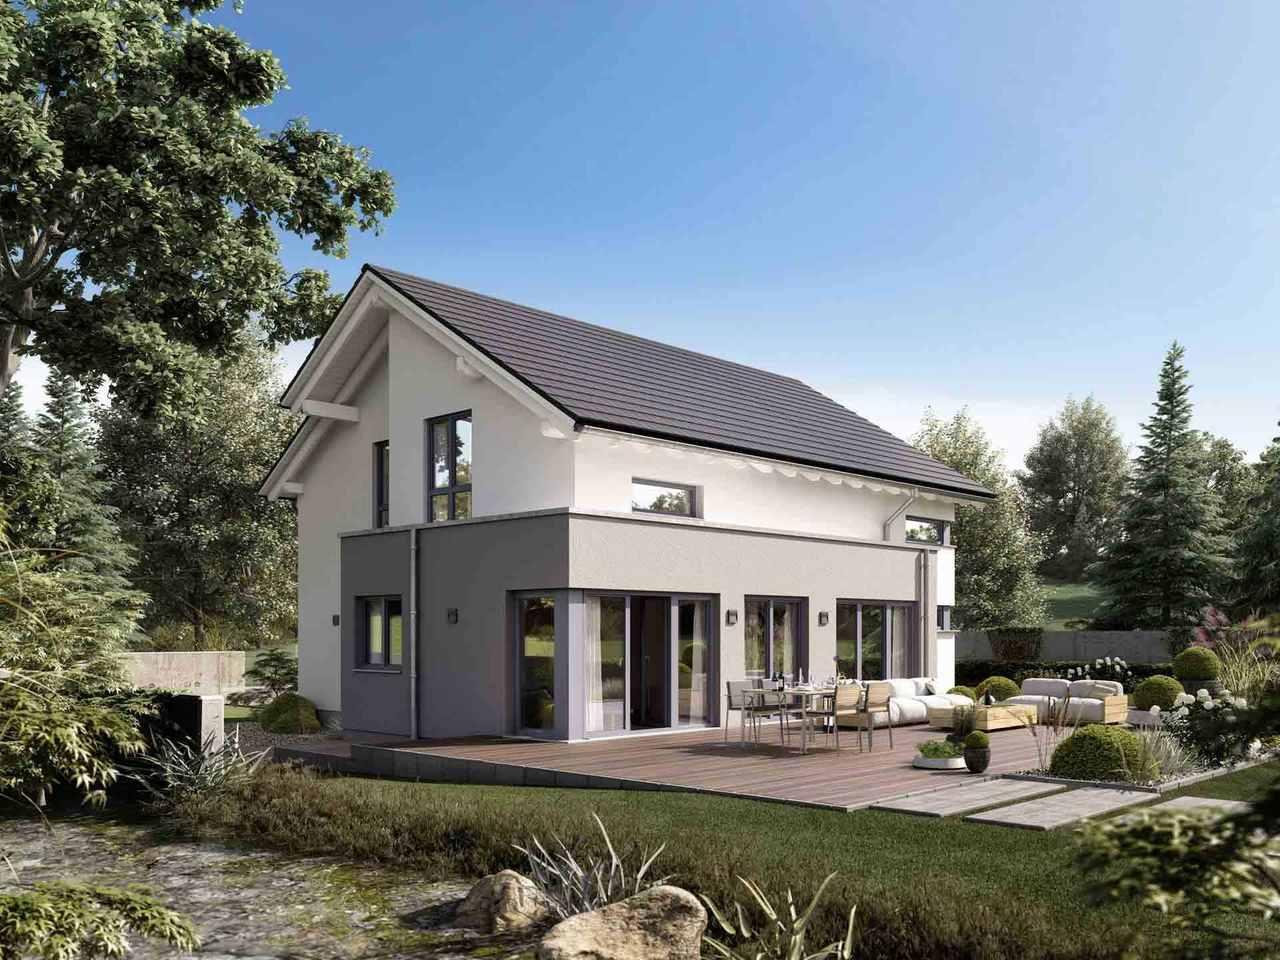 Einfamilienhaus Selection-E-175 E2 - Schwabenhaus